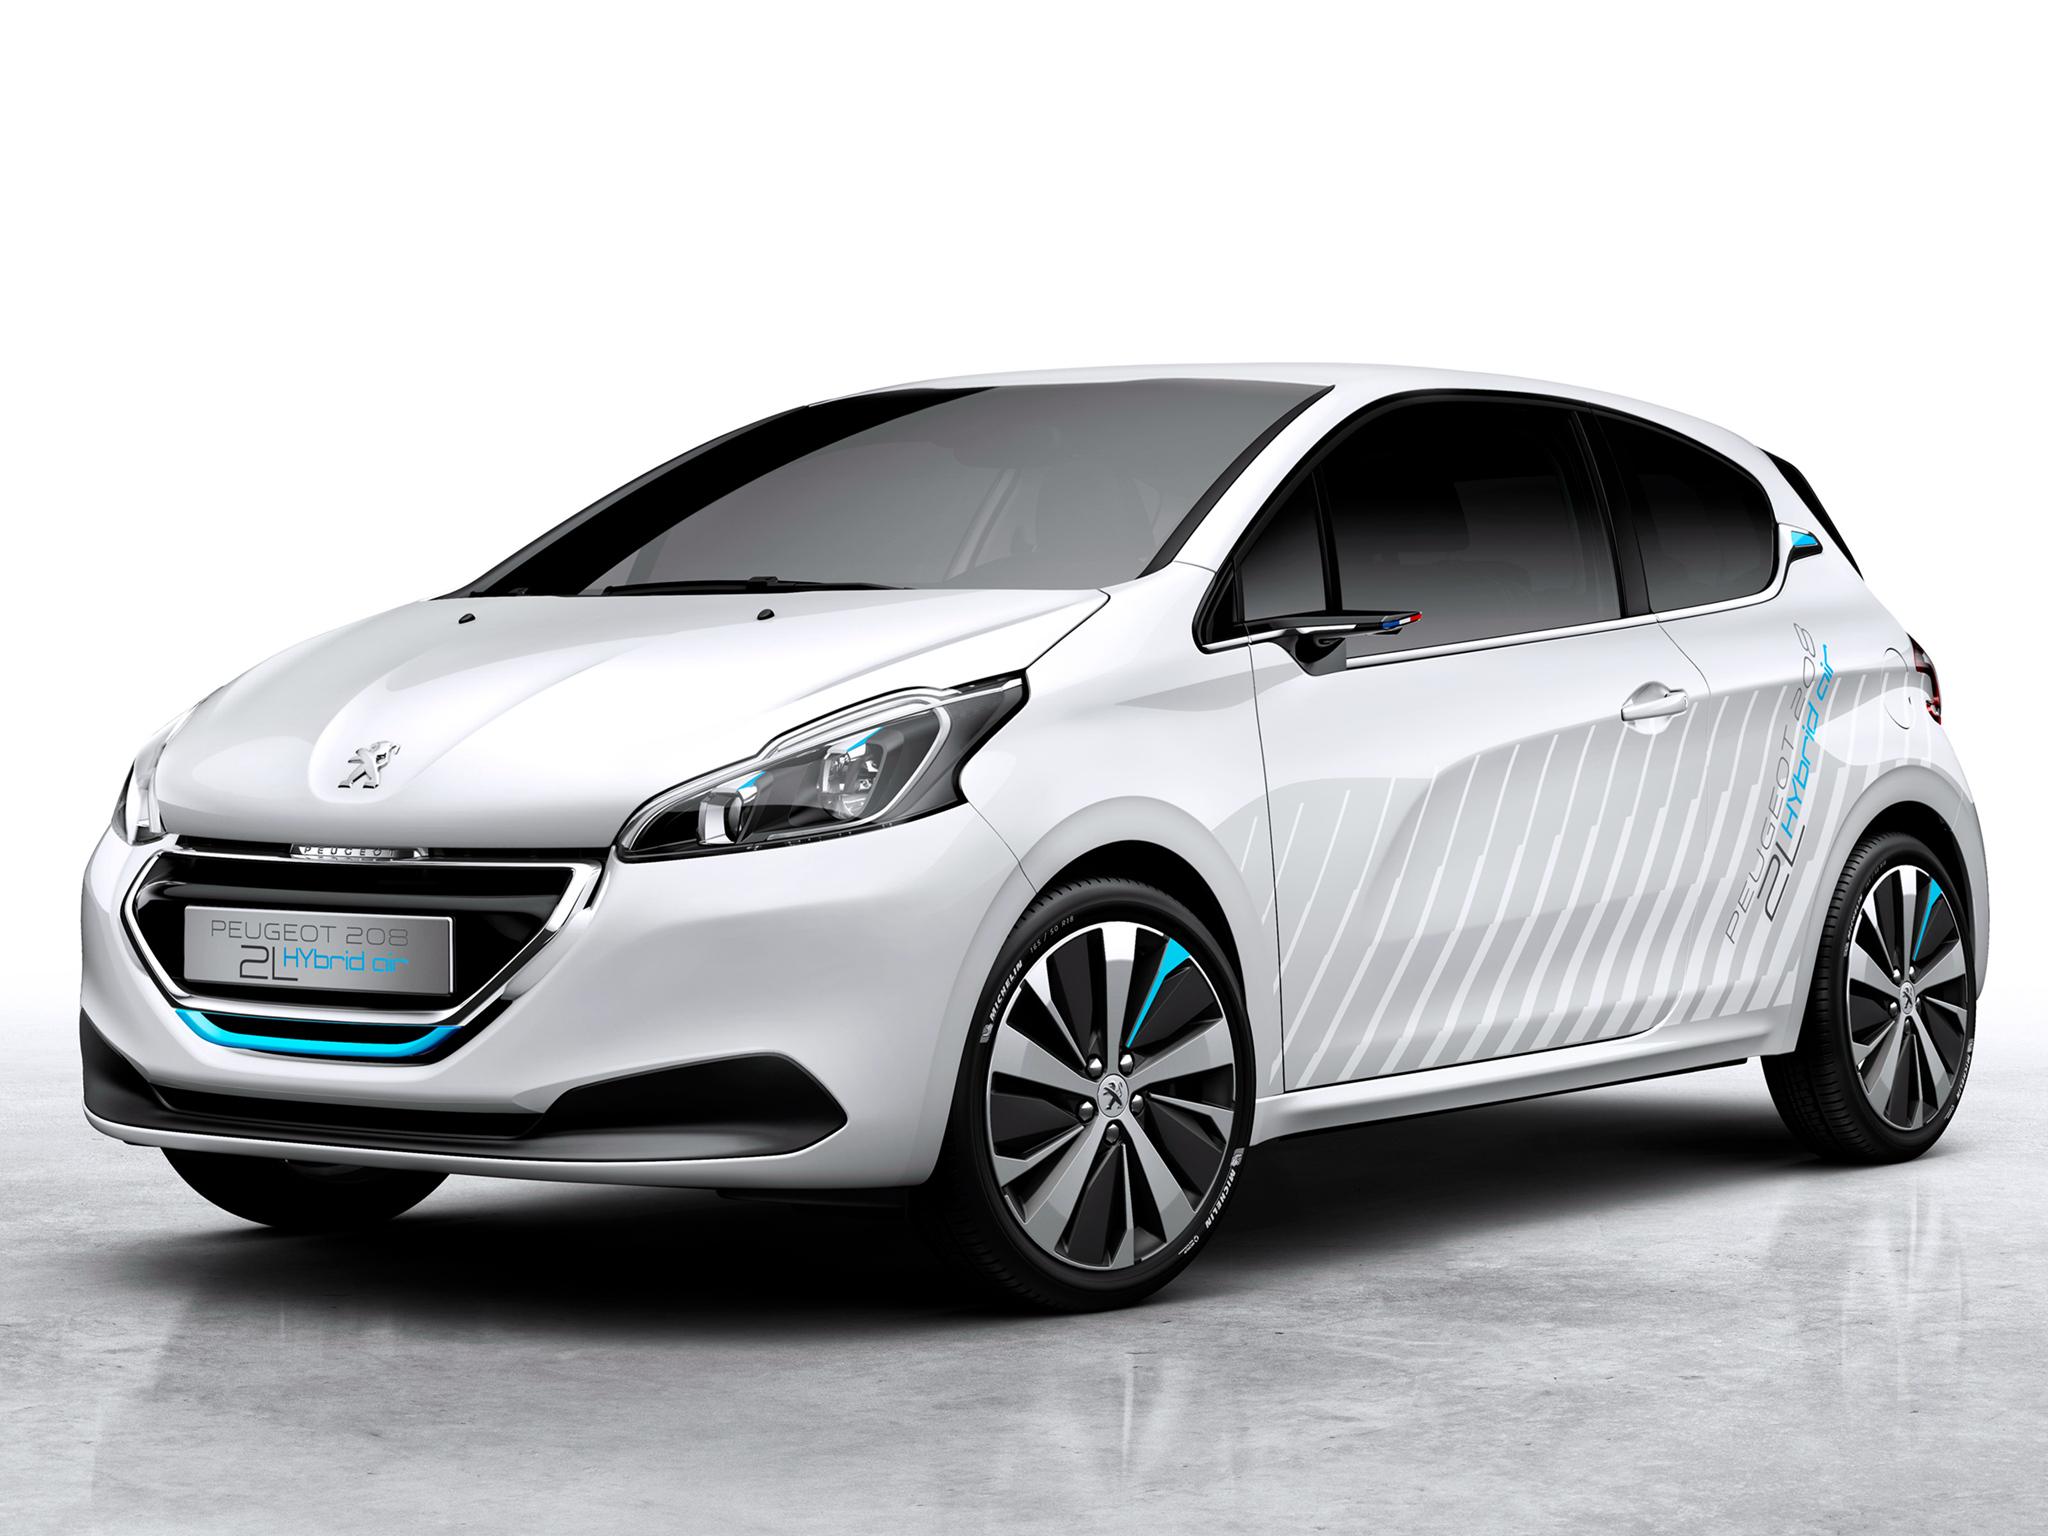 peugeot 208 hybrid air concept revealed ahead of paris debut autoevolution. Black Bedroom Furniture Sets. Home Design Ideas